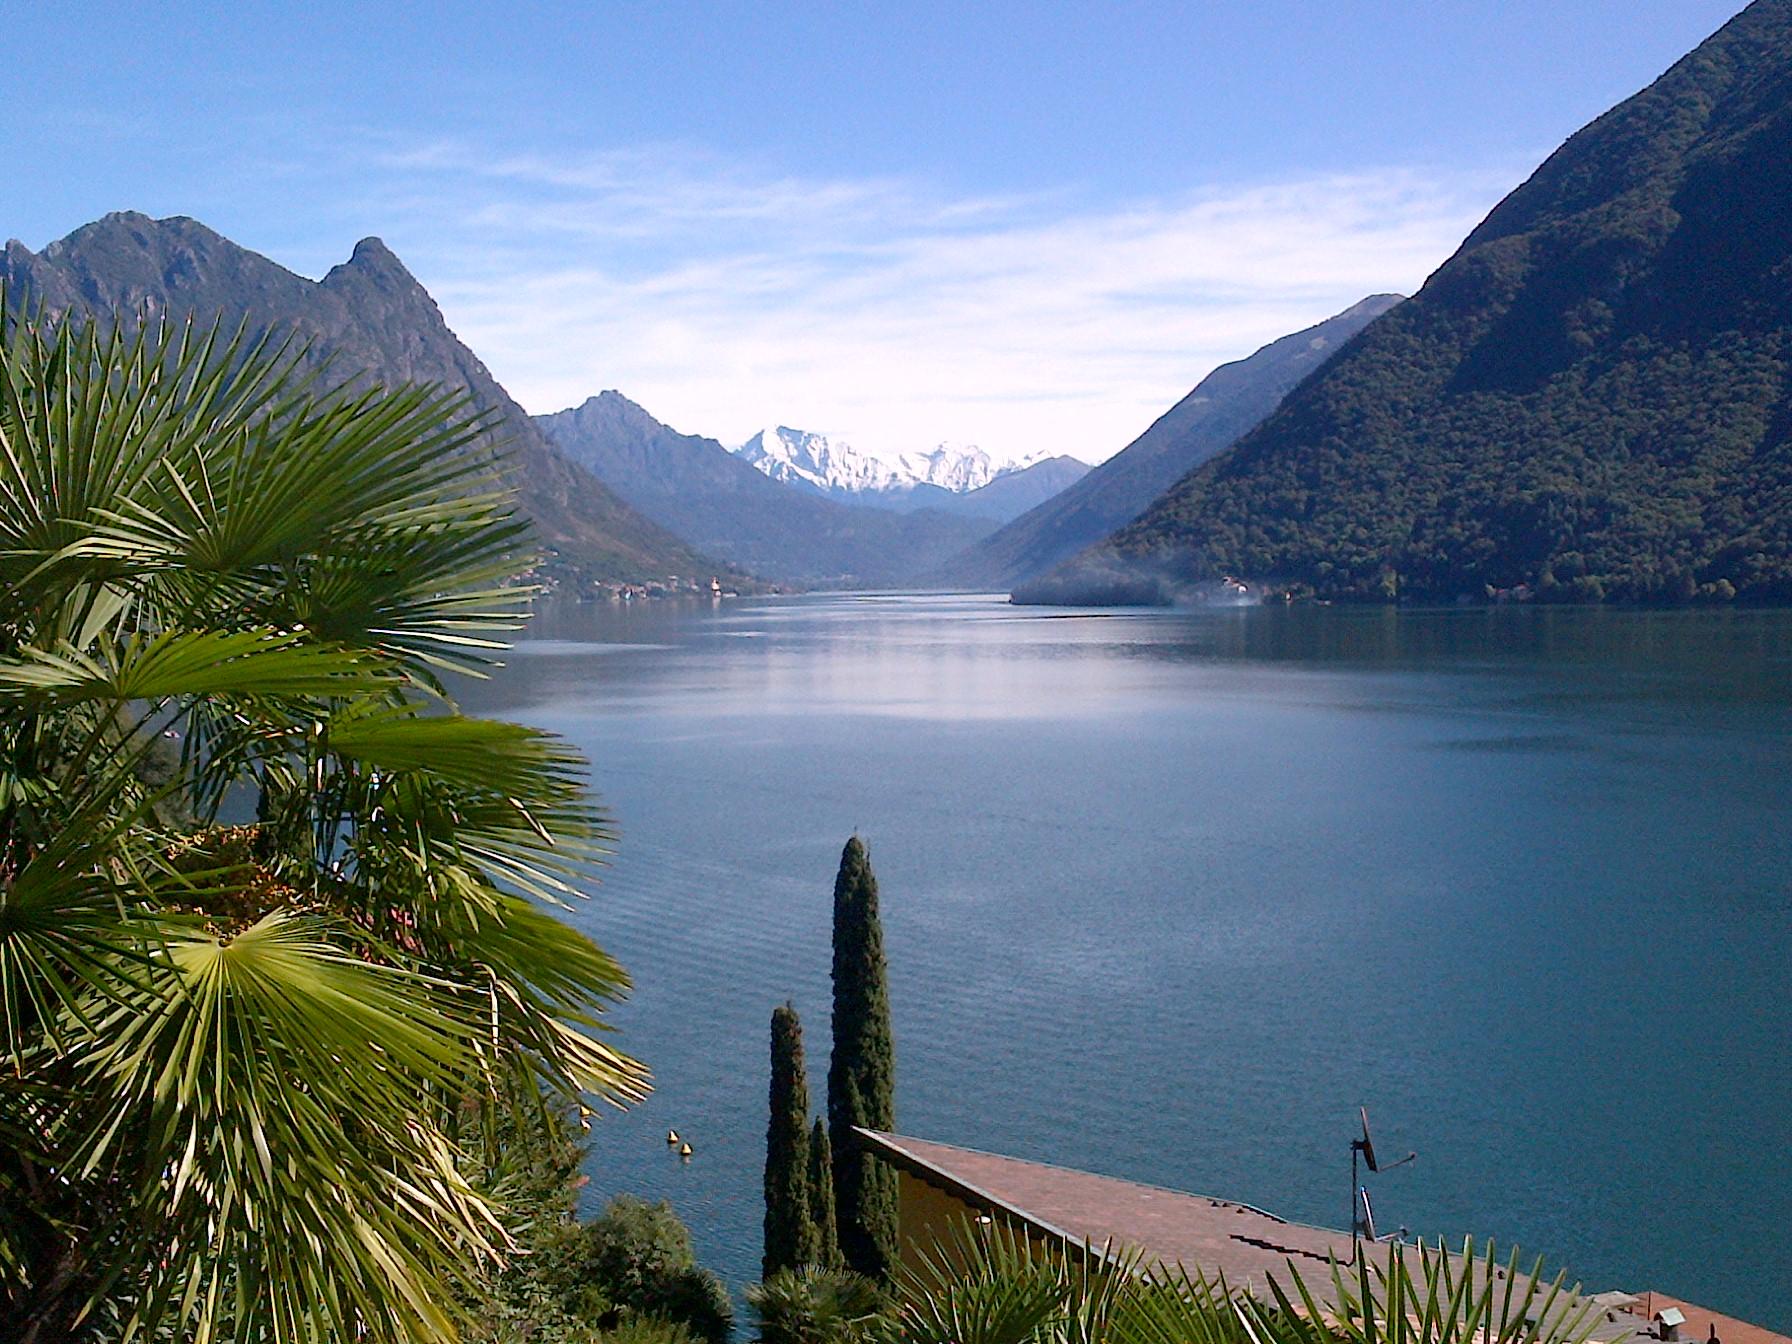 Gandria, Switzeralnd, just a couple miles north of Lugano